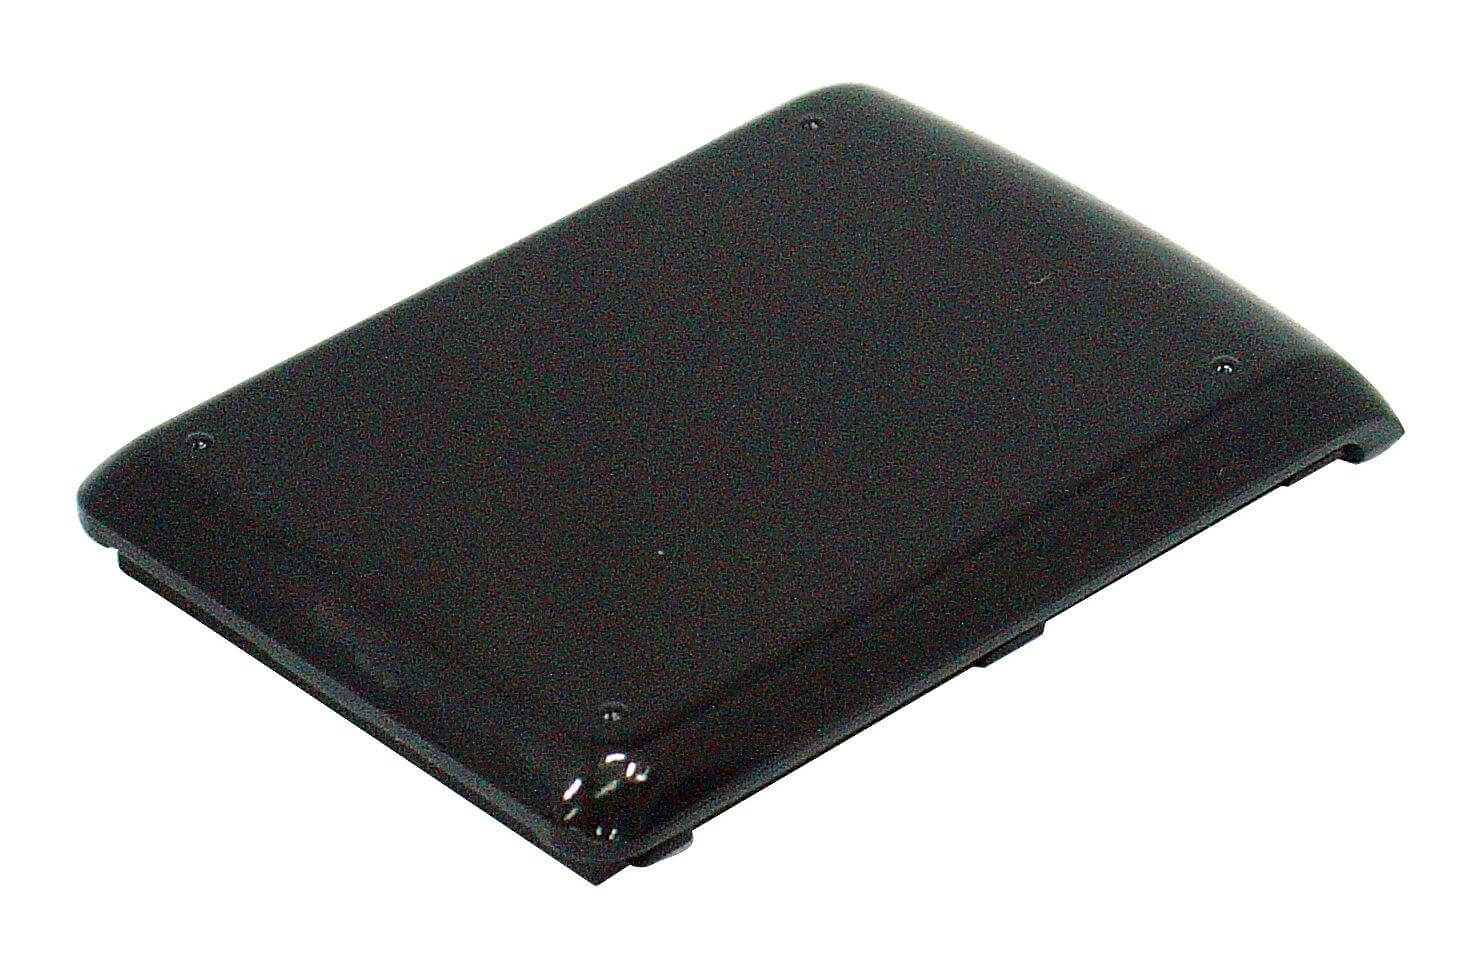 LG KG800 batteri